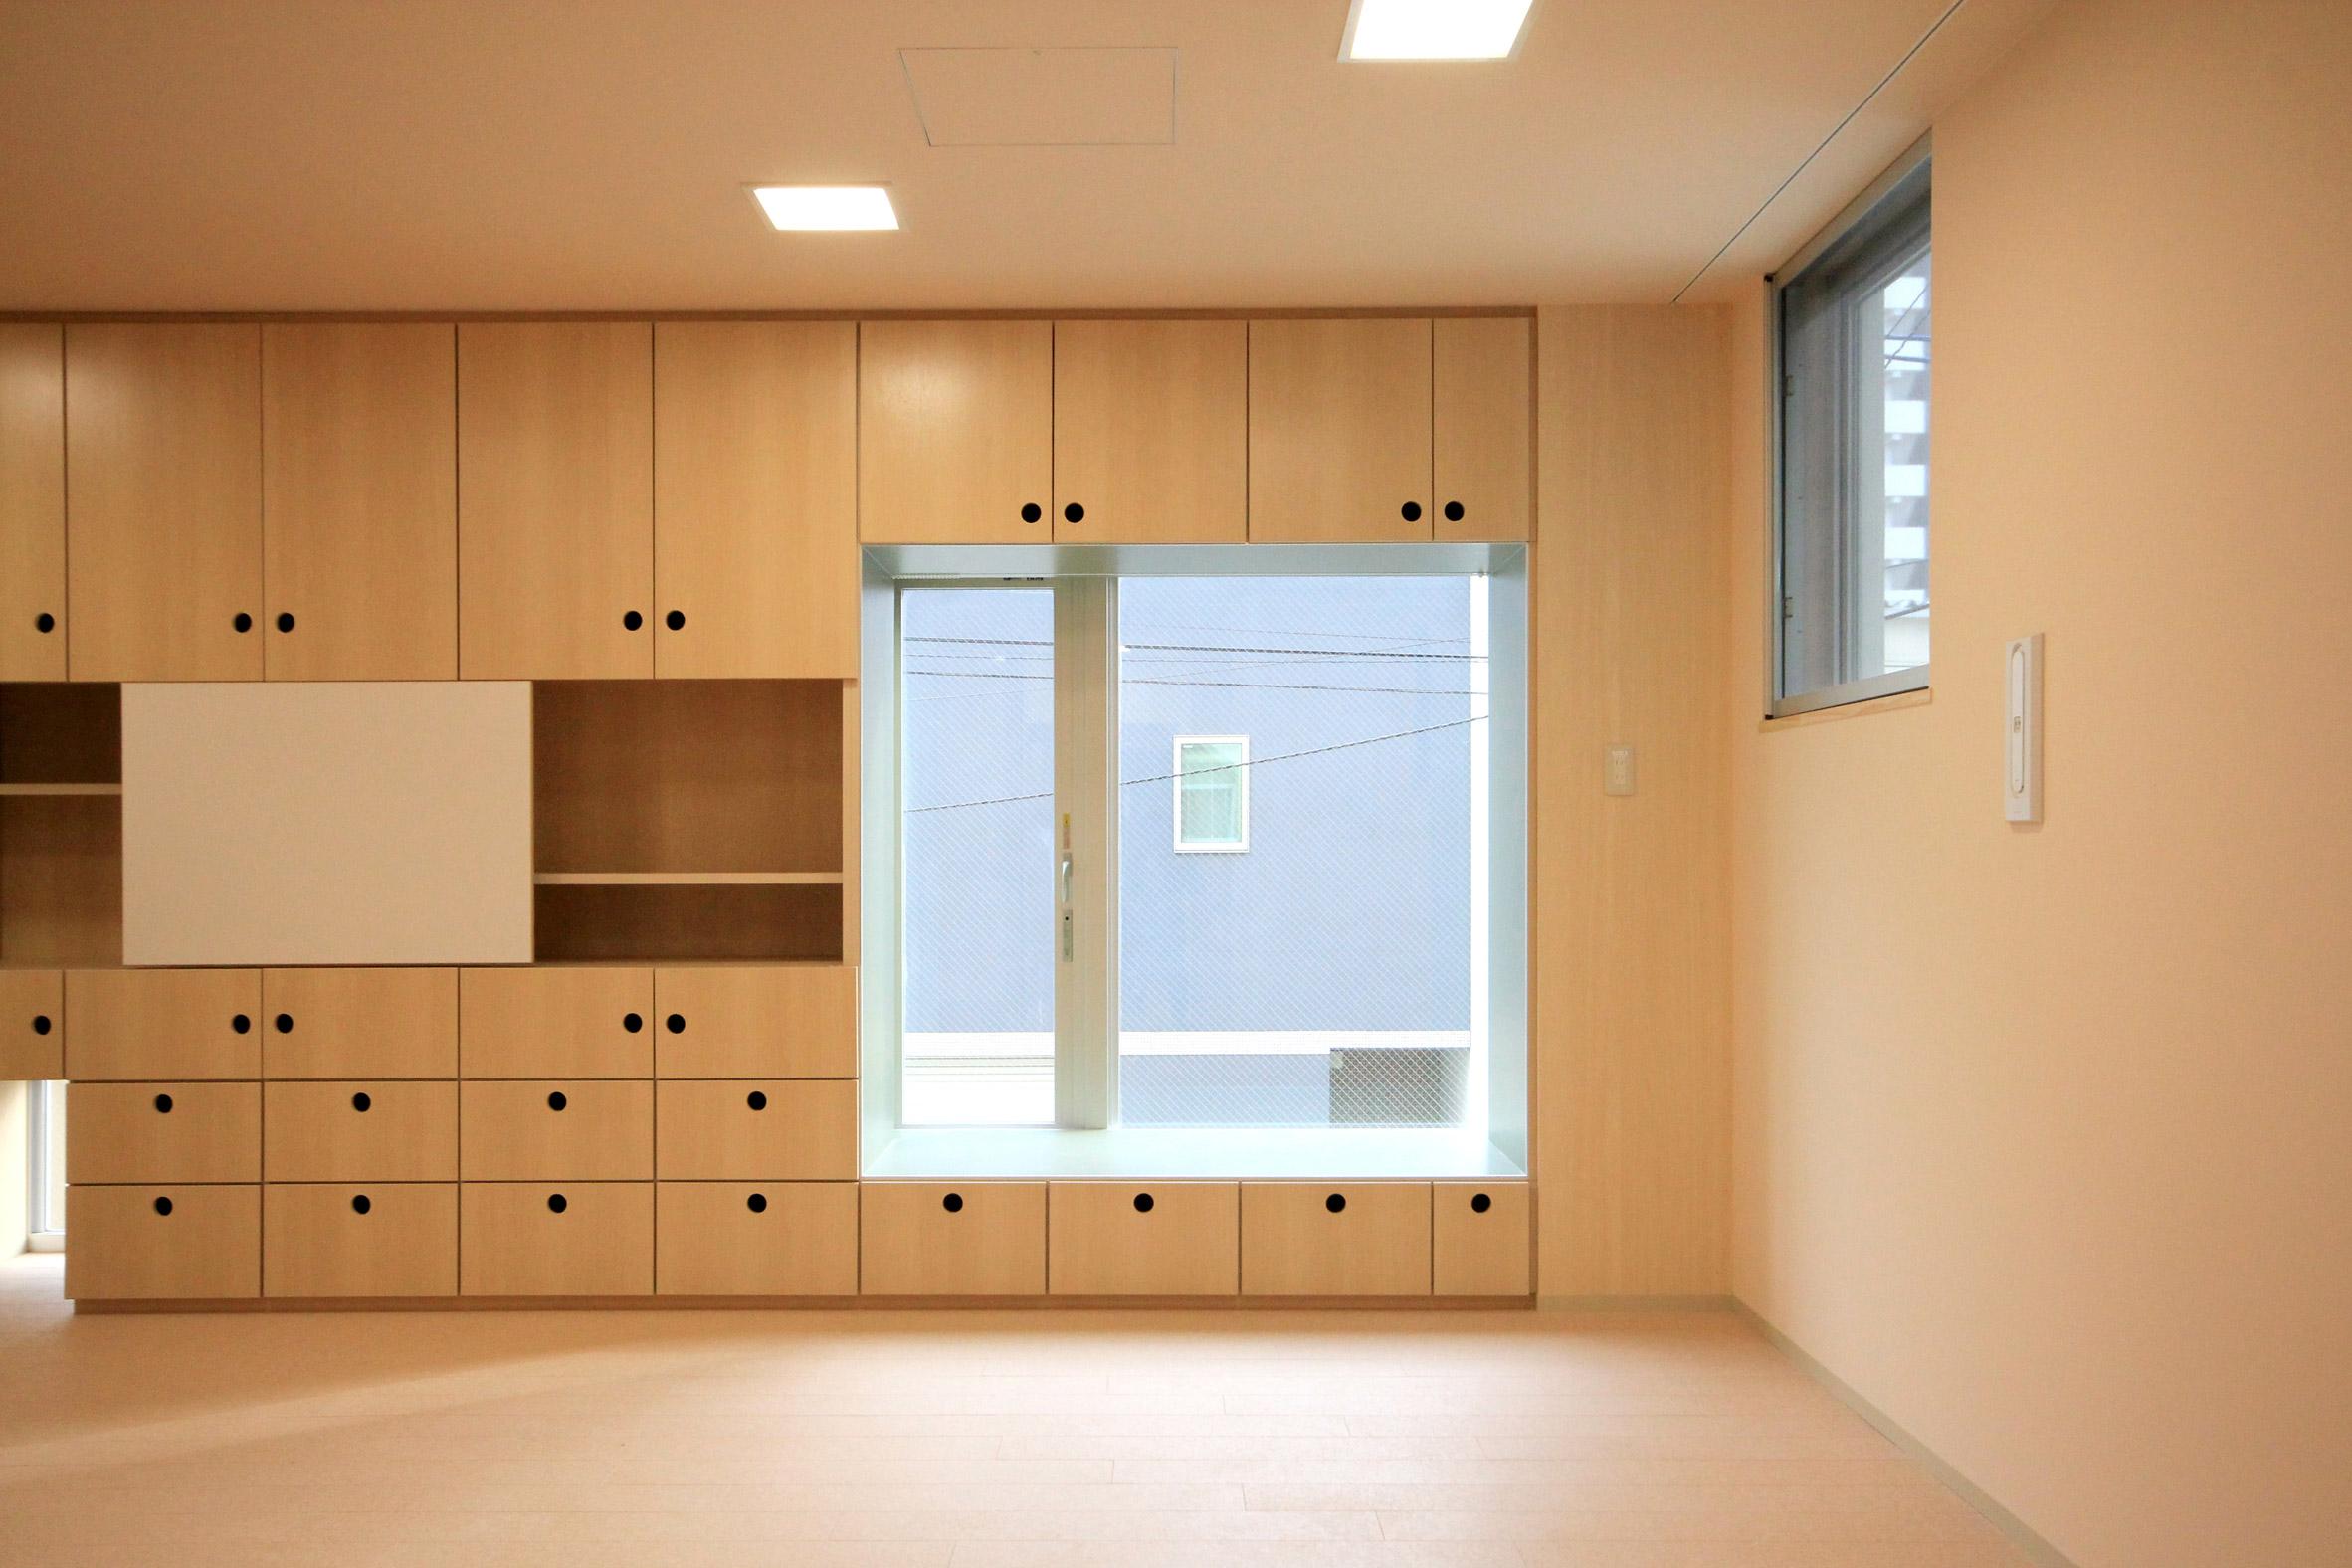 Morinoie nursery school by Masahiko Fujimori Architects